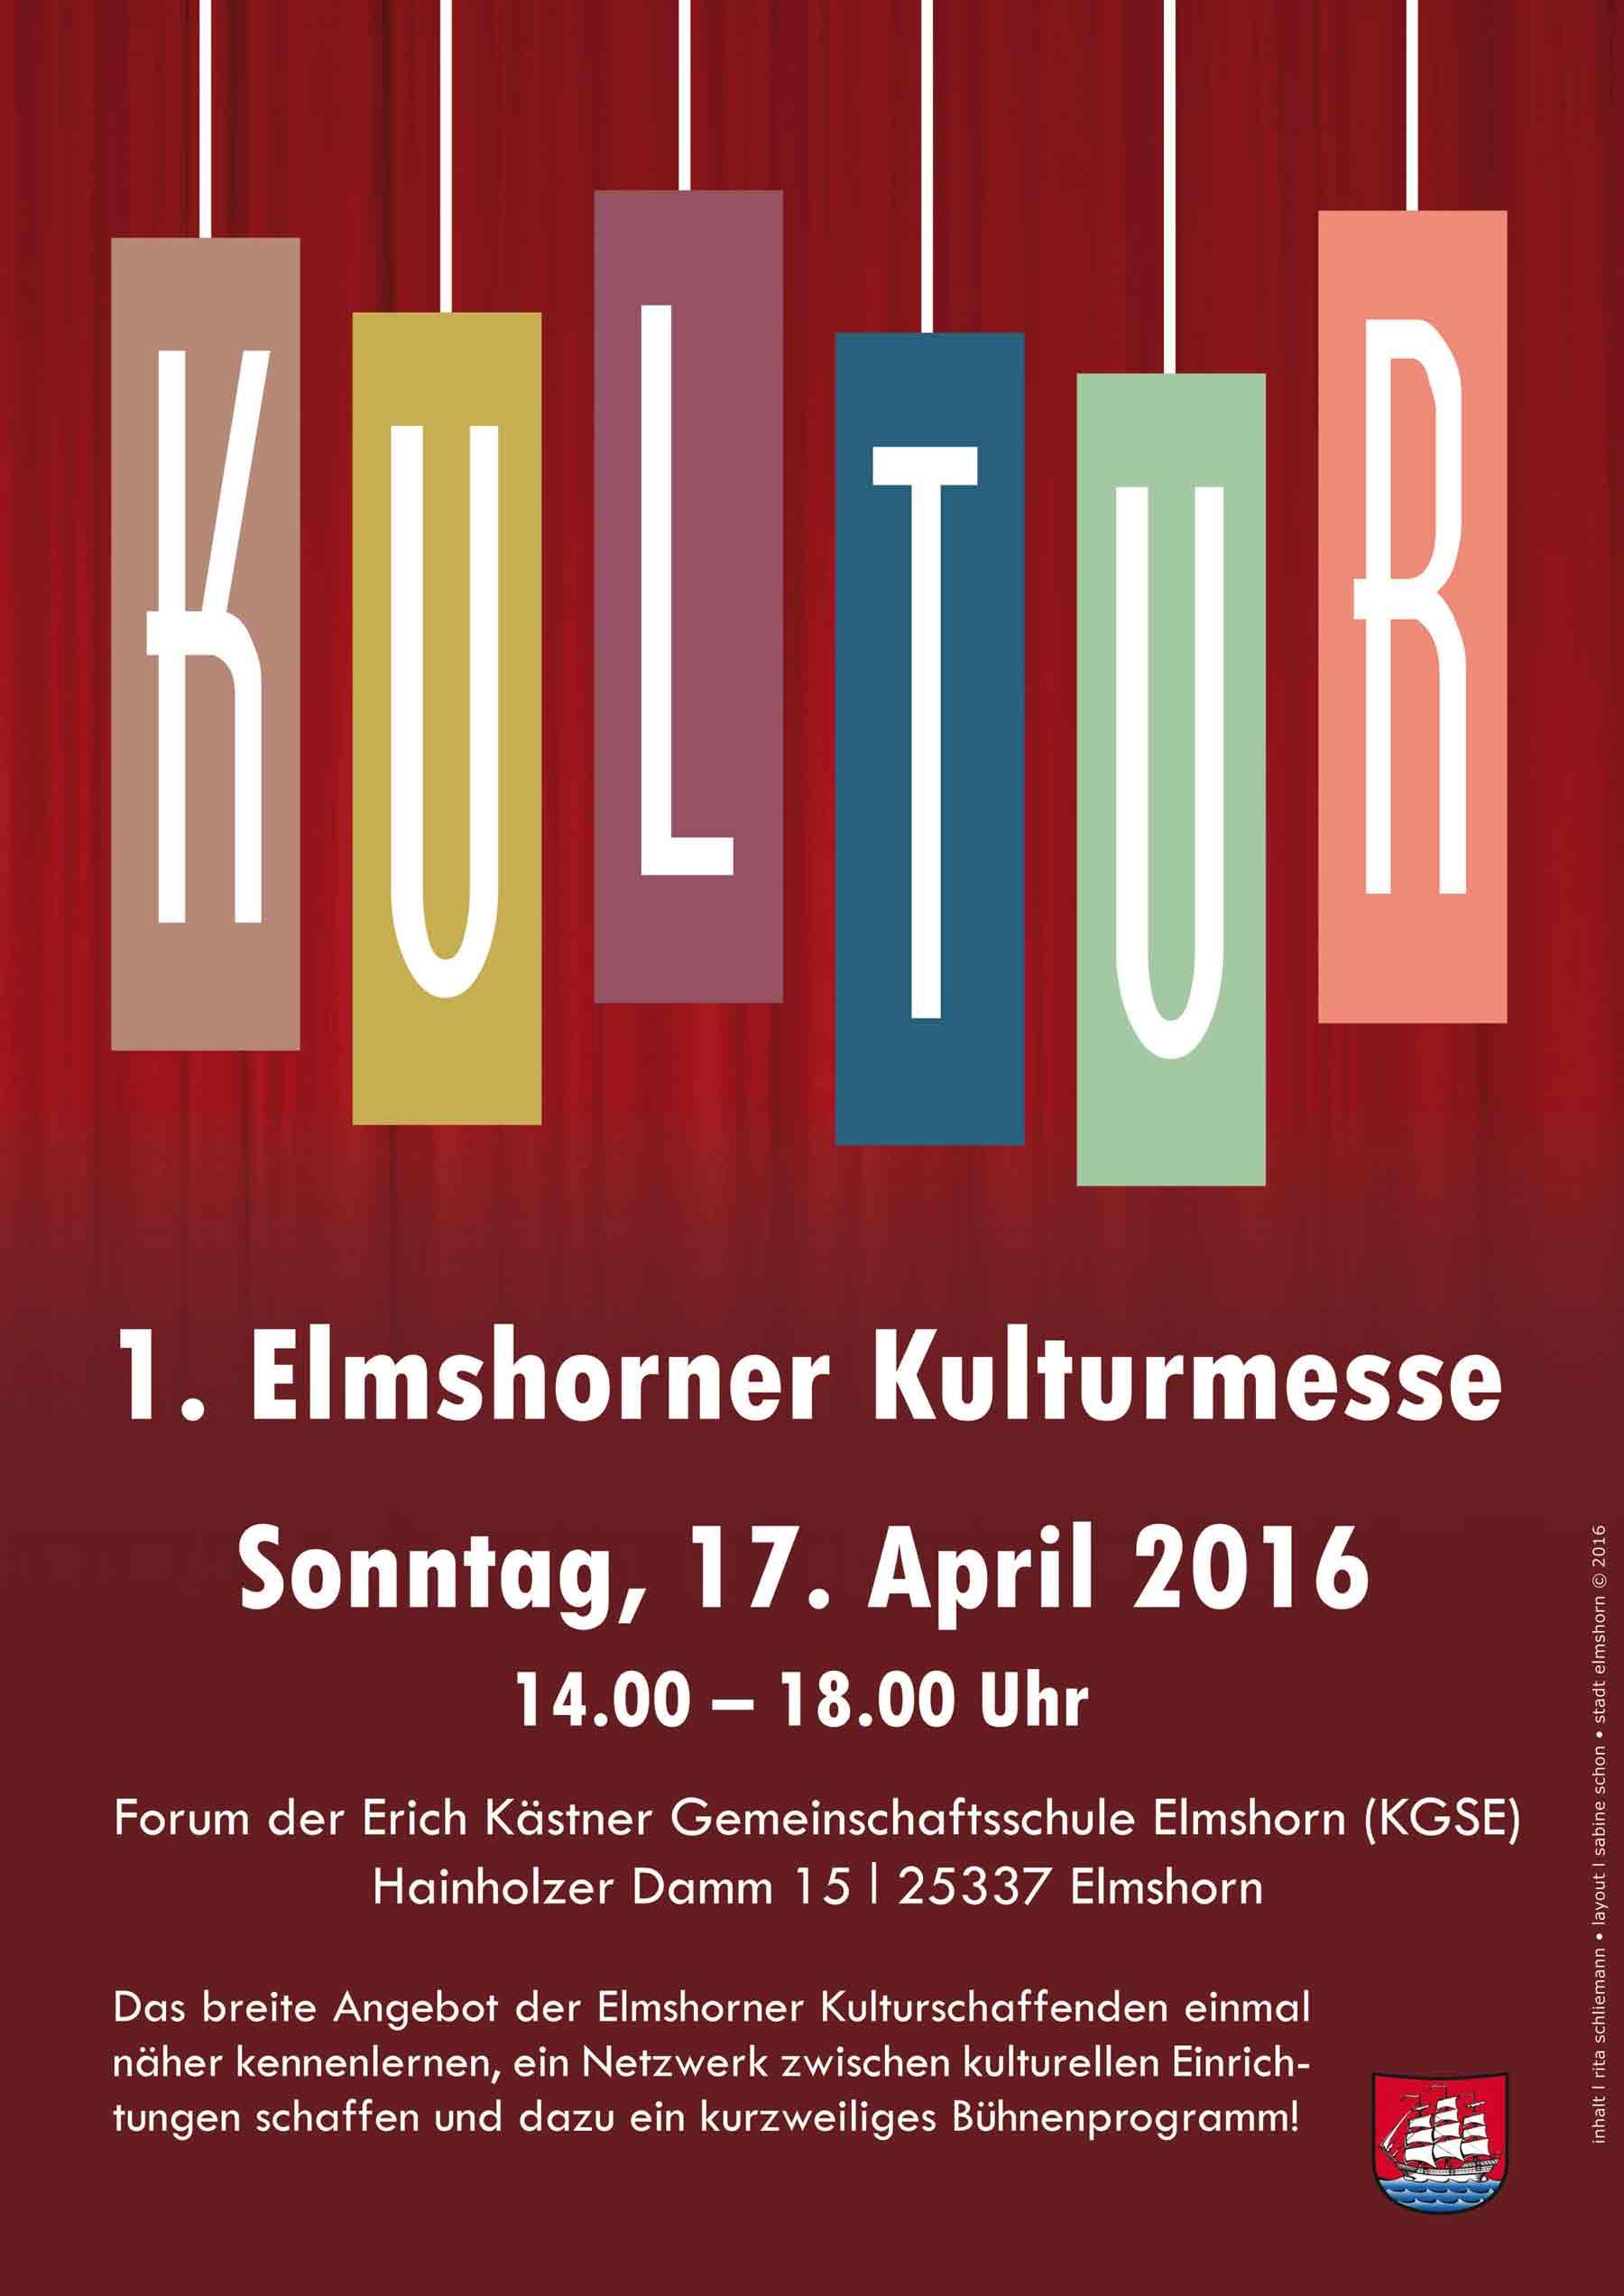 Plakat_Kulturmesse_Elmshorn_2016-web